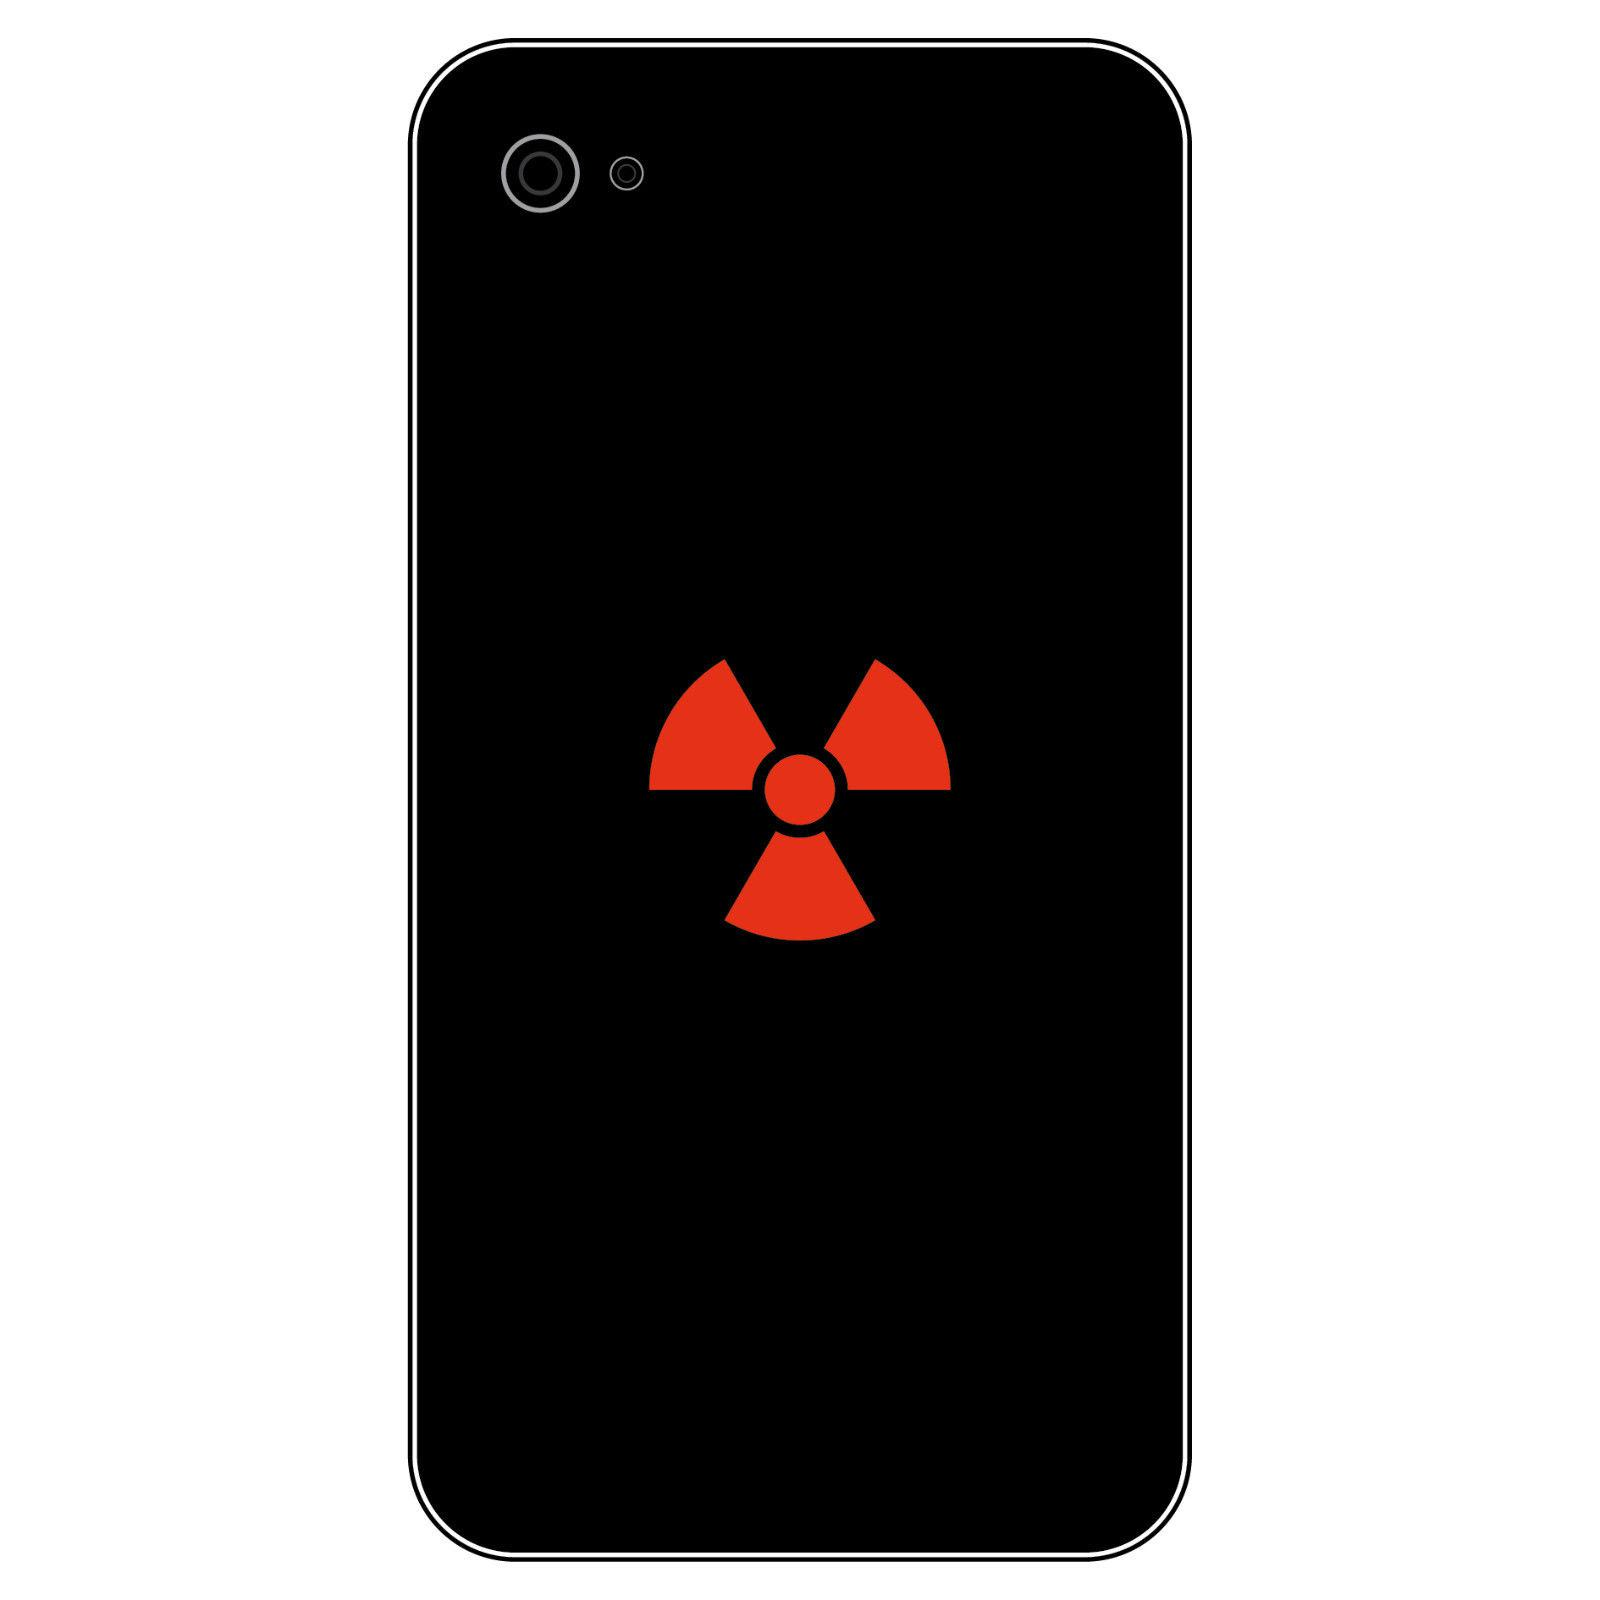 ... 8 Aufkleber Tattoo 2, 5cm Rot Radioaktiv Symbol Logo Handy Smartphone  Deko Folie 2 ...